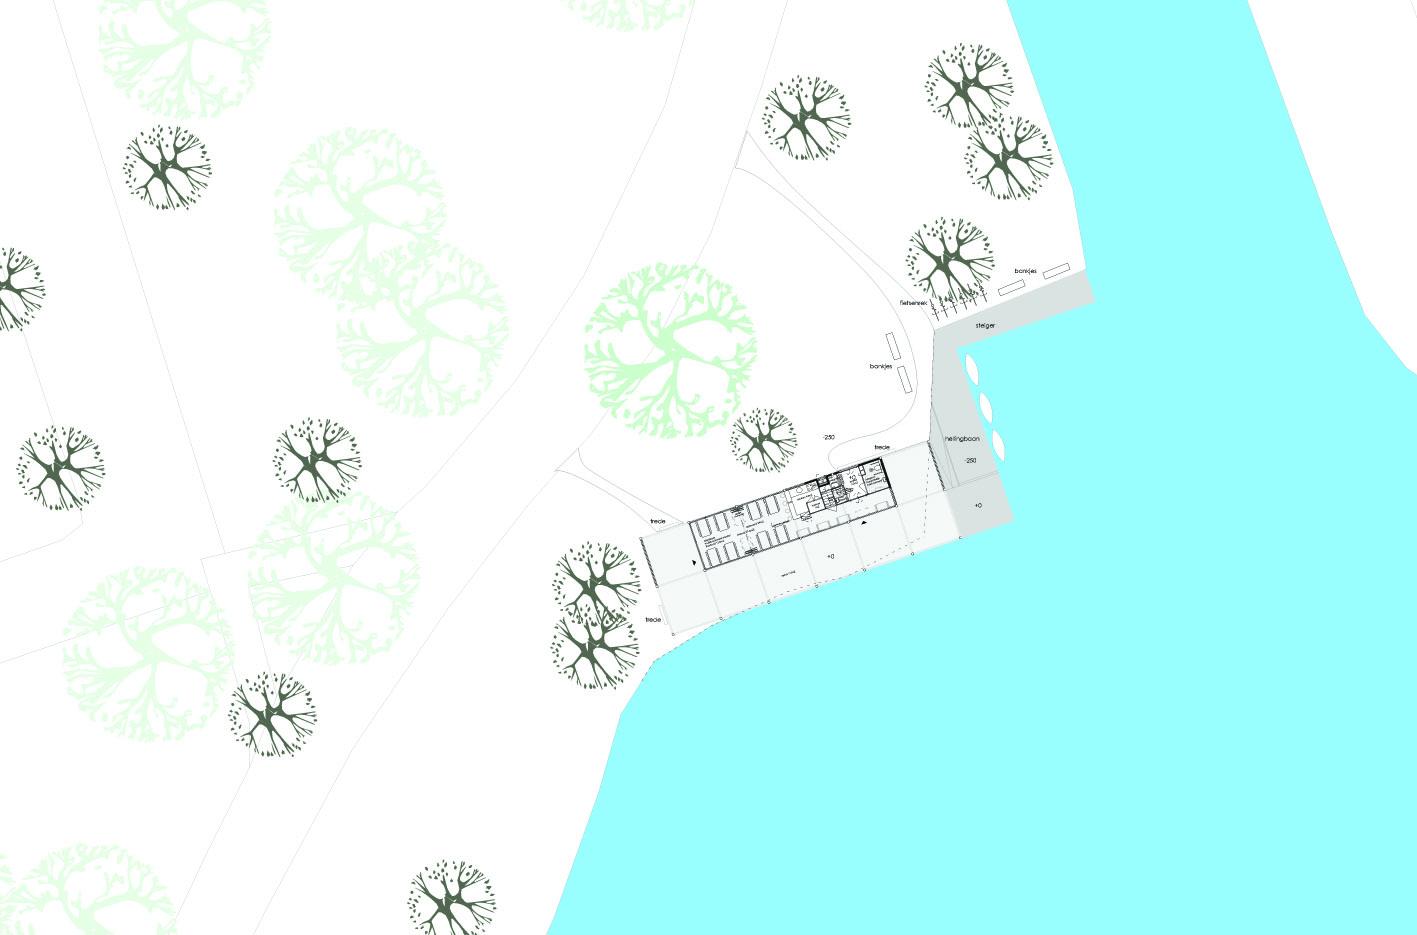 Theehuis Paviljoen plattegrond Schellingwouderbreek plas Amsterdam Noord